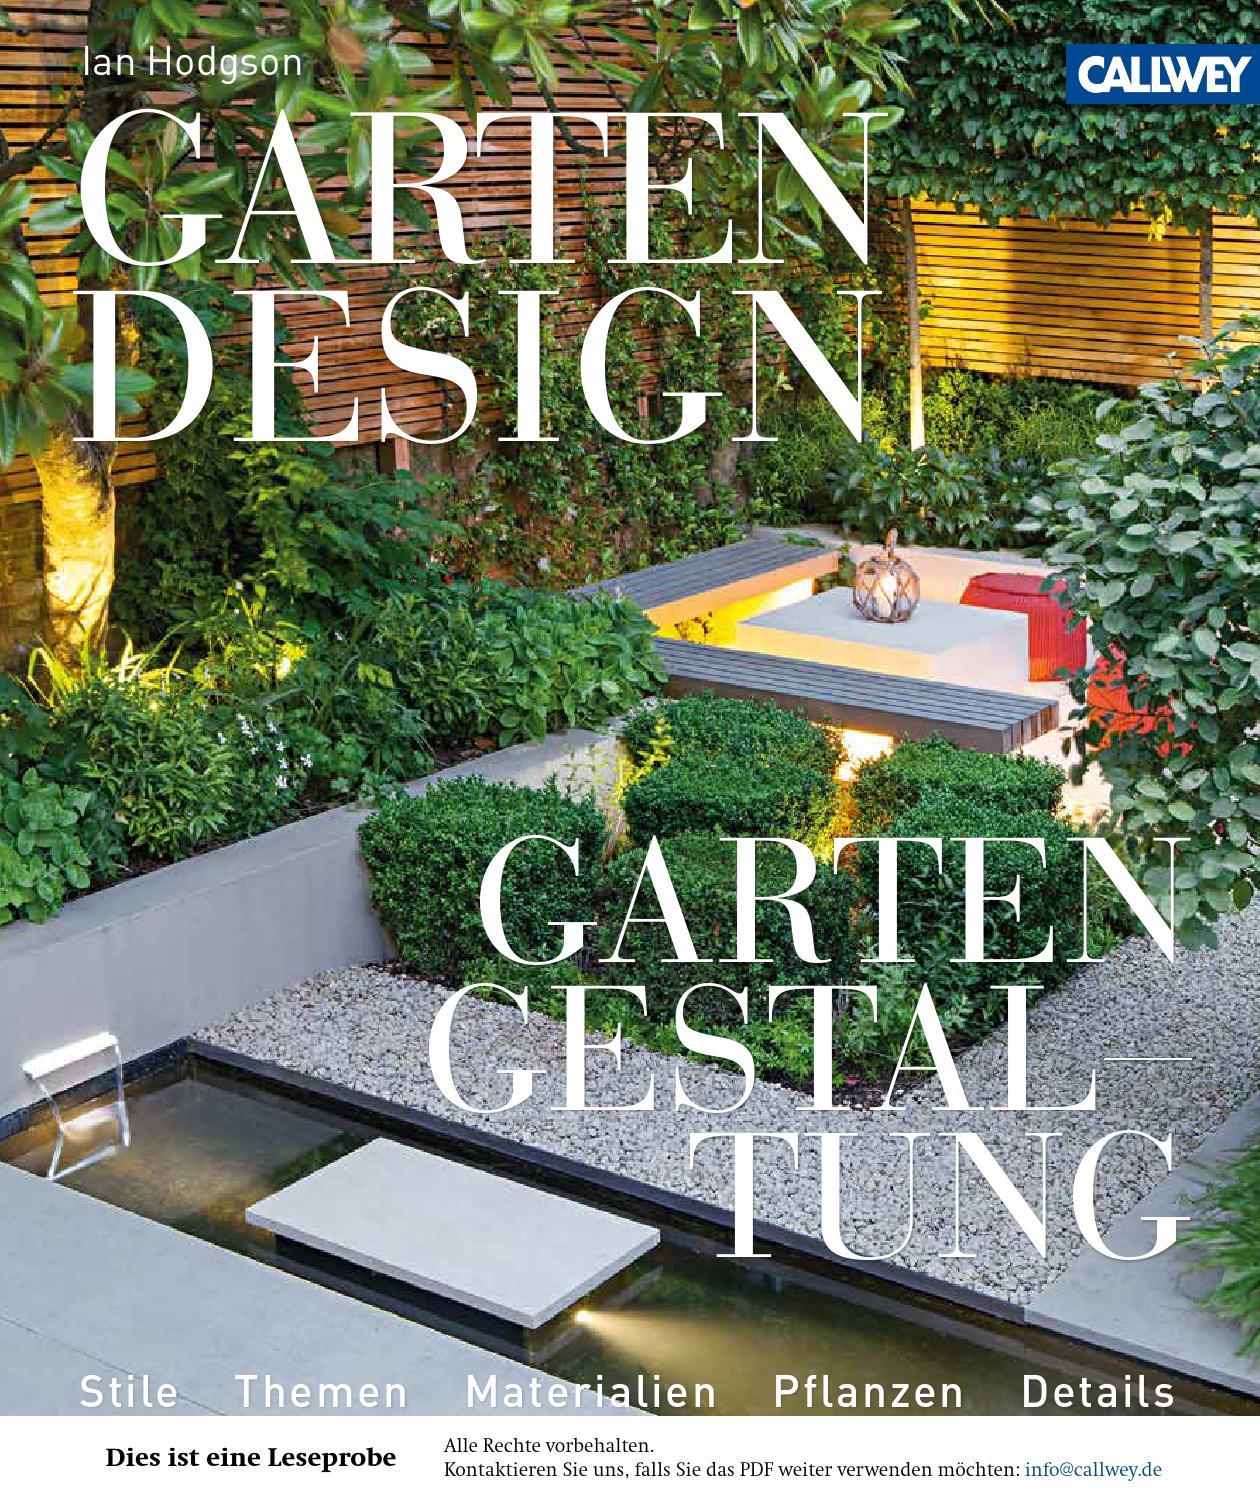 Hodgson, Gartendesign - Gartengestaltung By Georg D.w. Callwey ... Kreative Gartendesigns Rasen